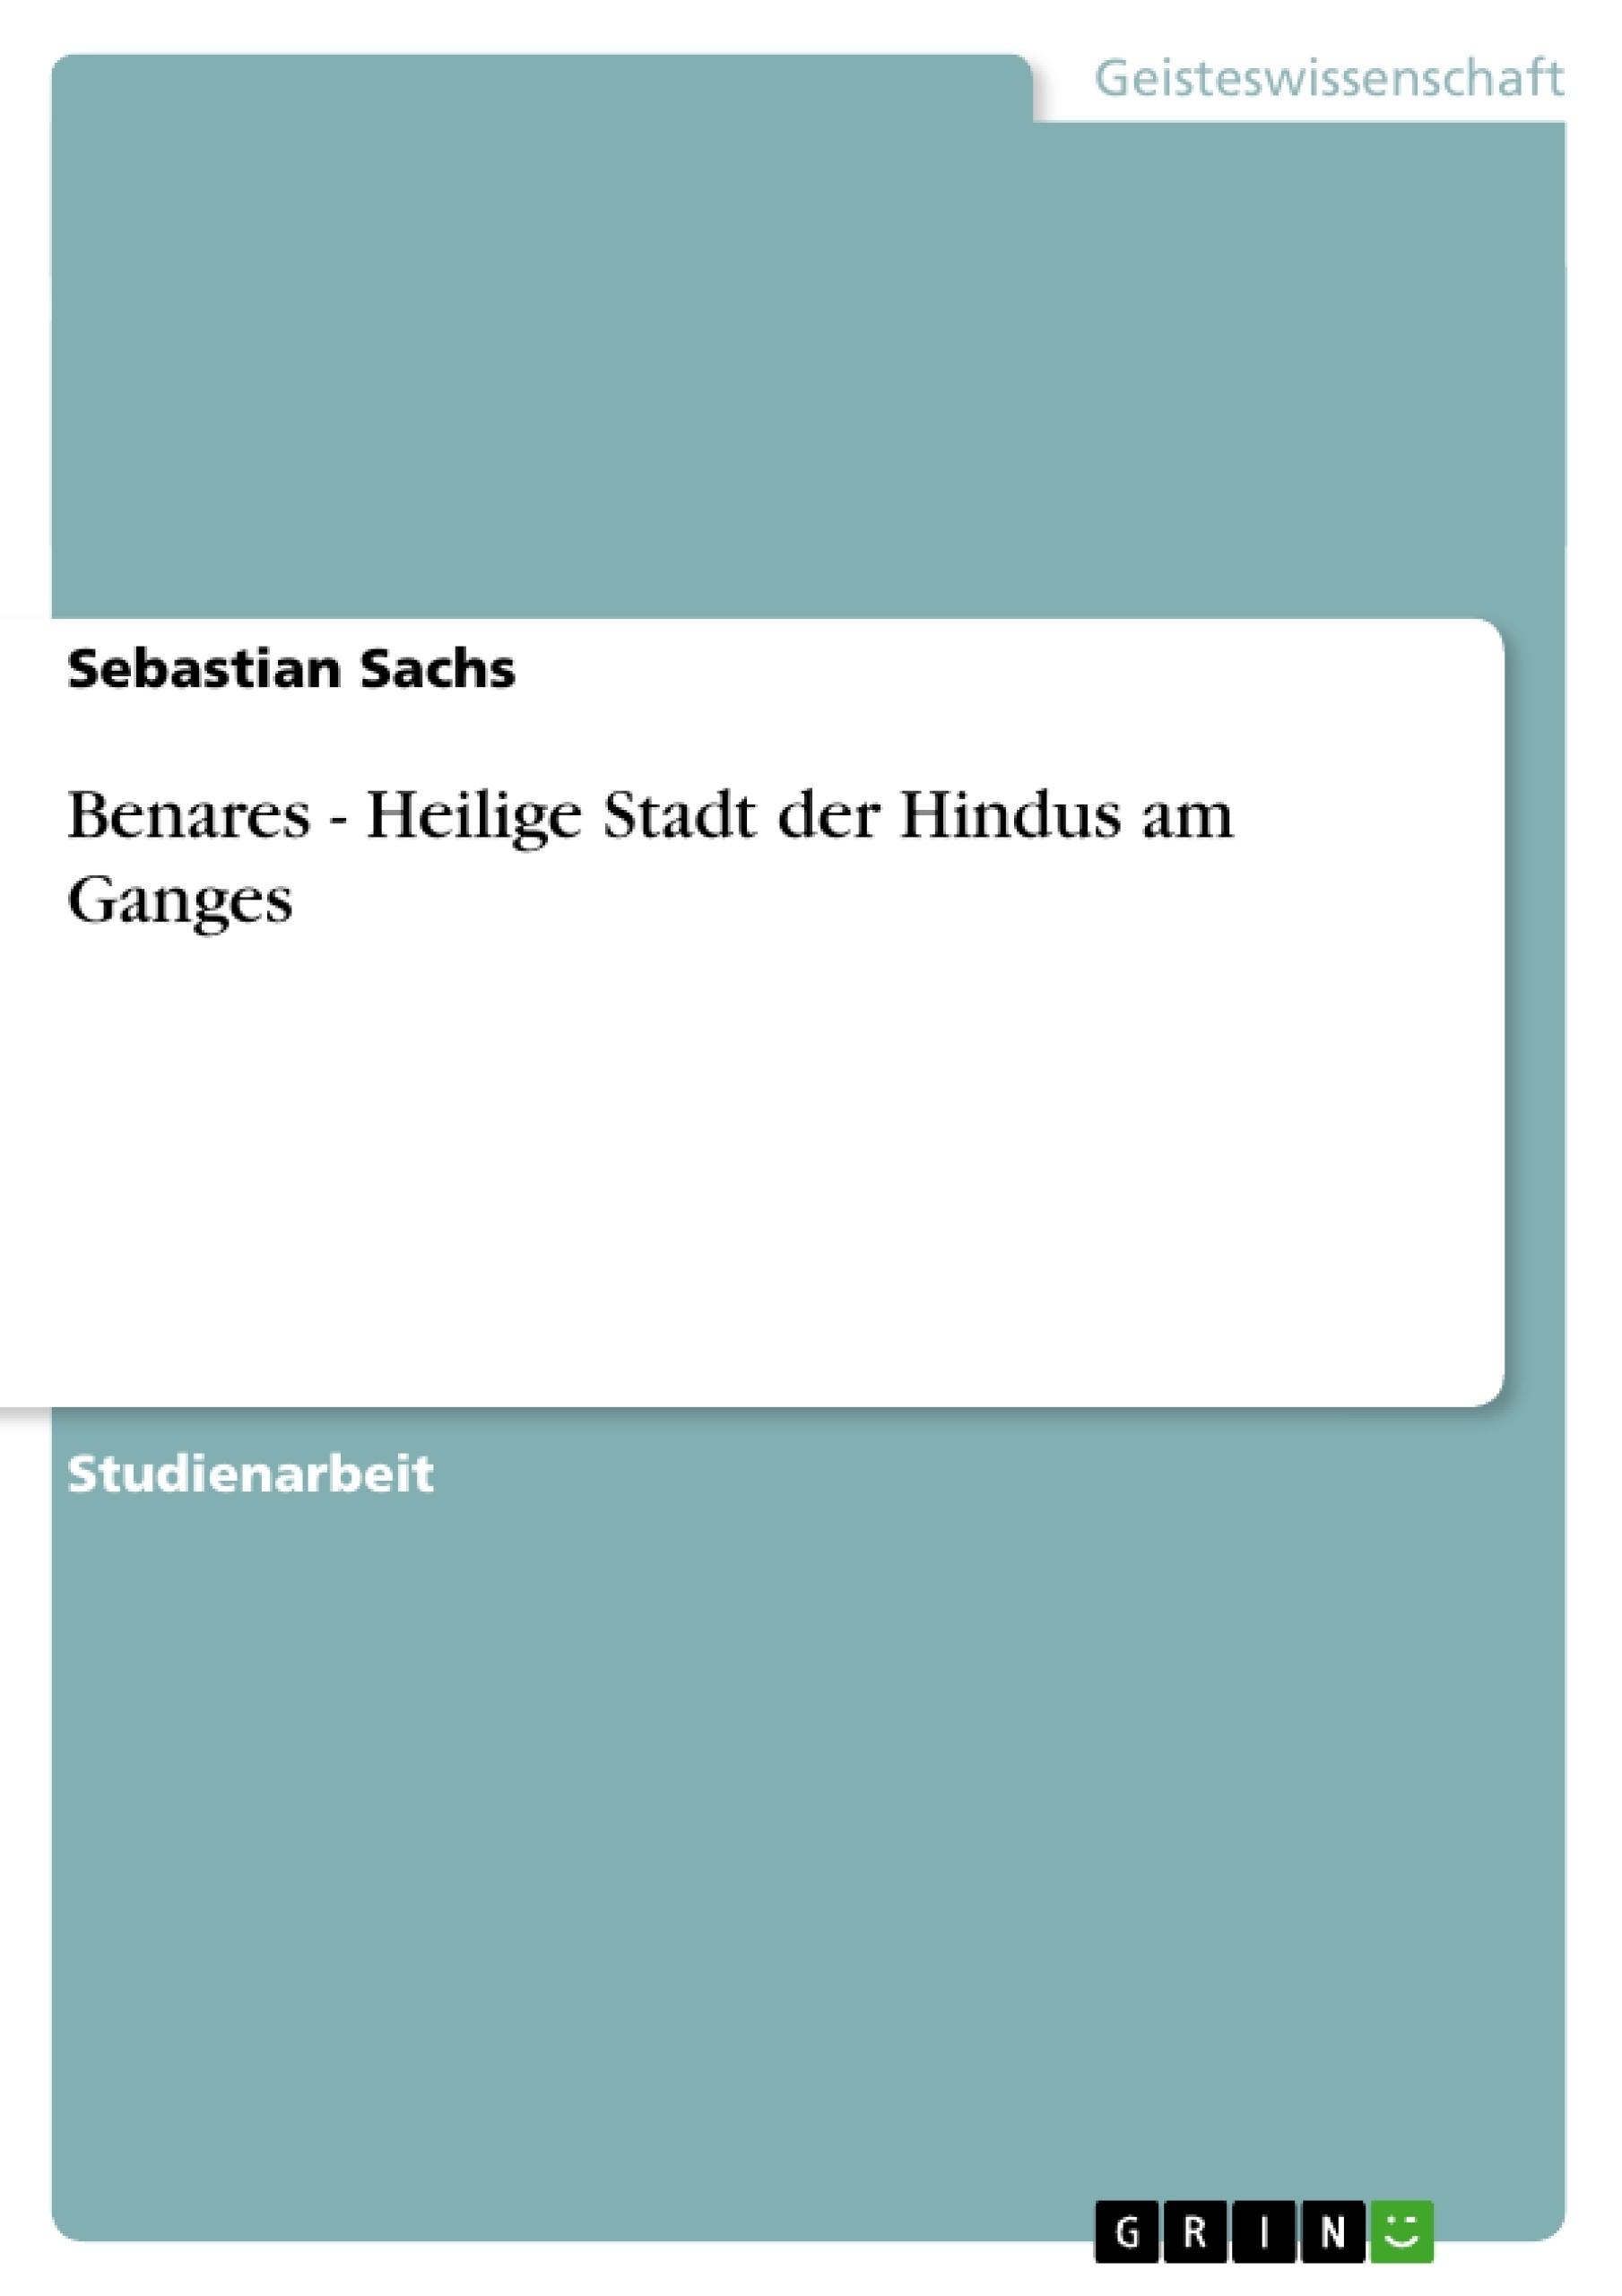 Titel: Benares - Heilige Stadt der Hindus am Ganges